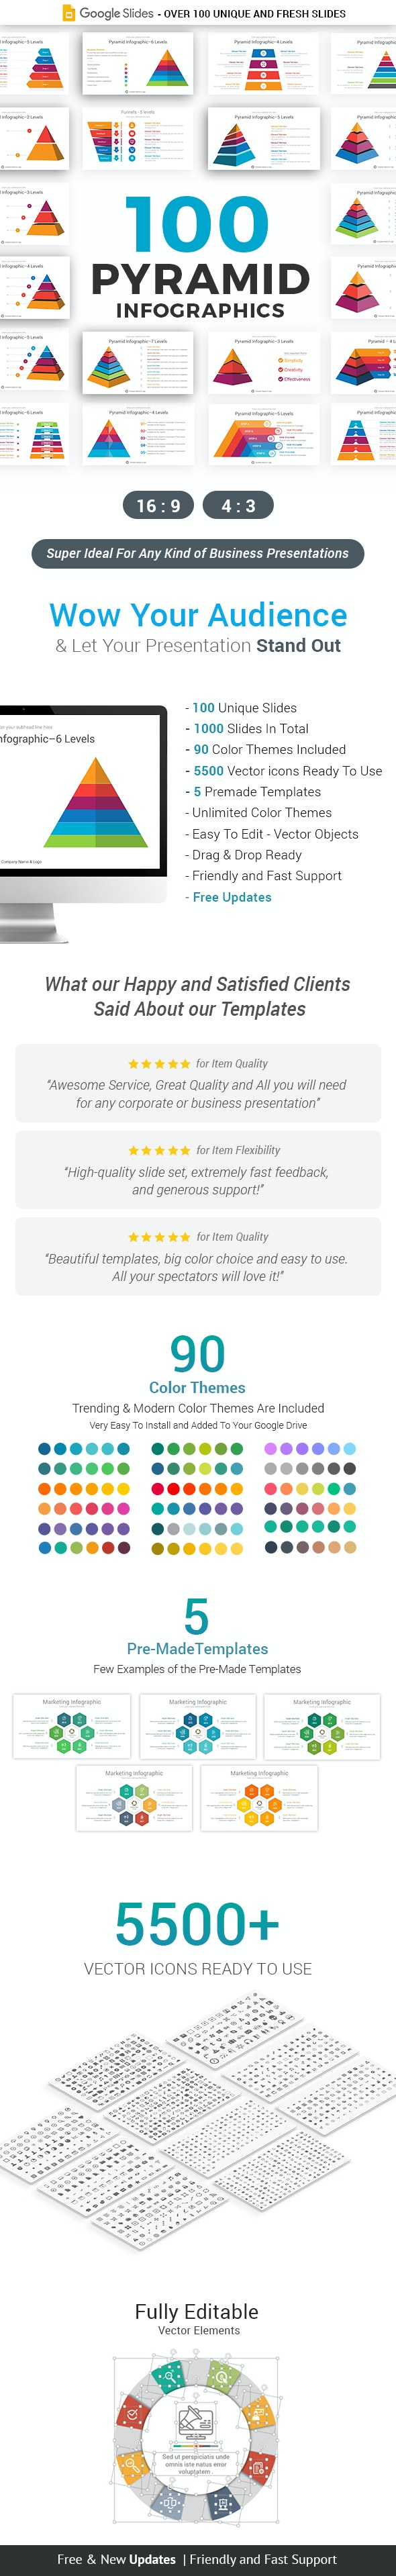 Pyramid Infographics Google Slides Template Diagrams - Google Slides Presentation Templates